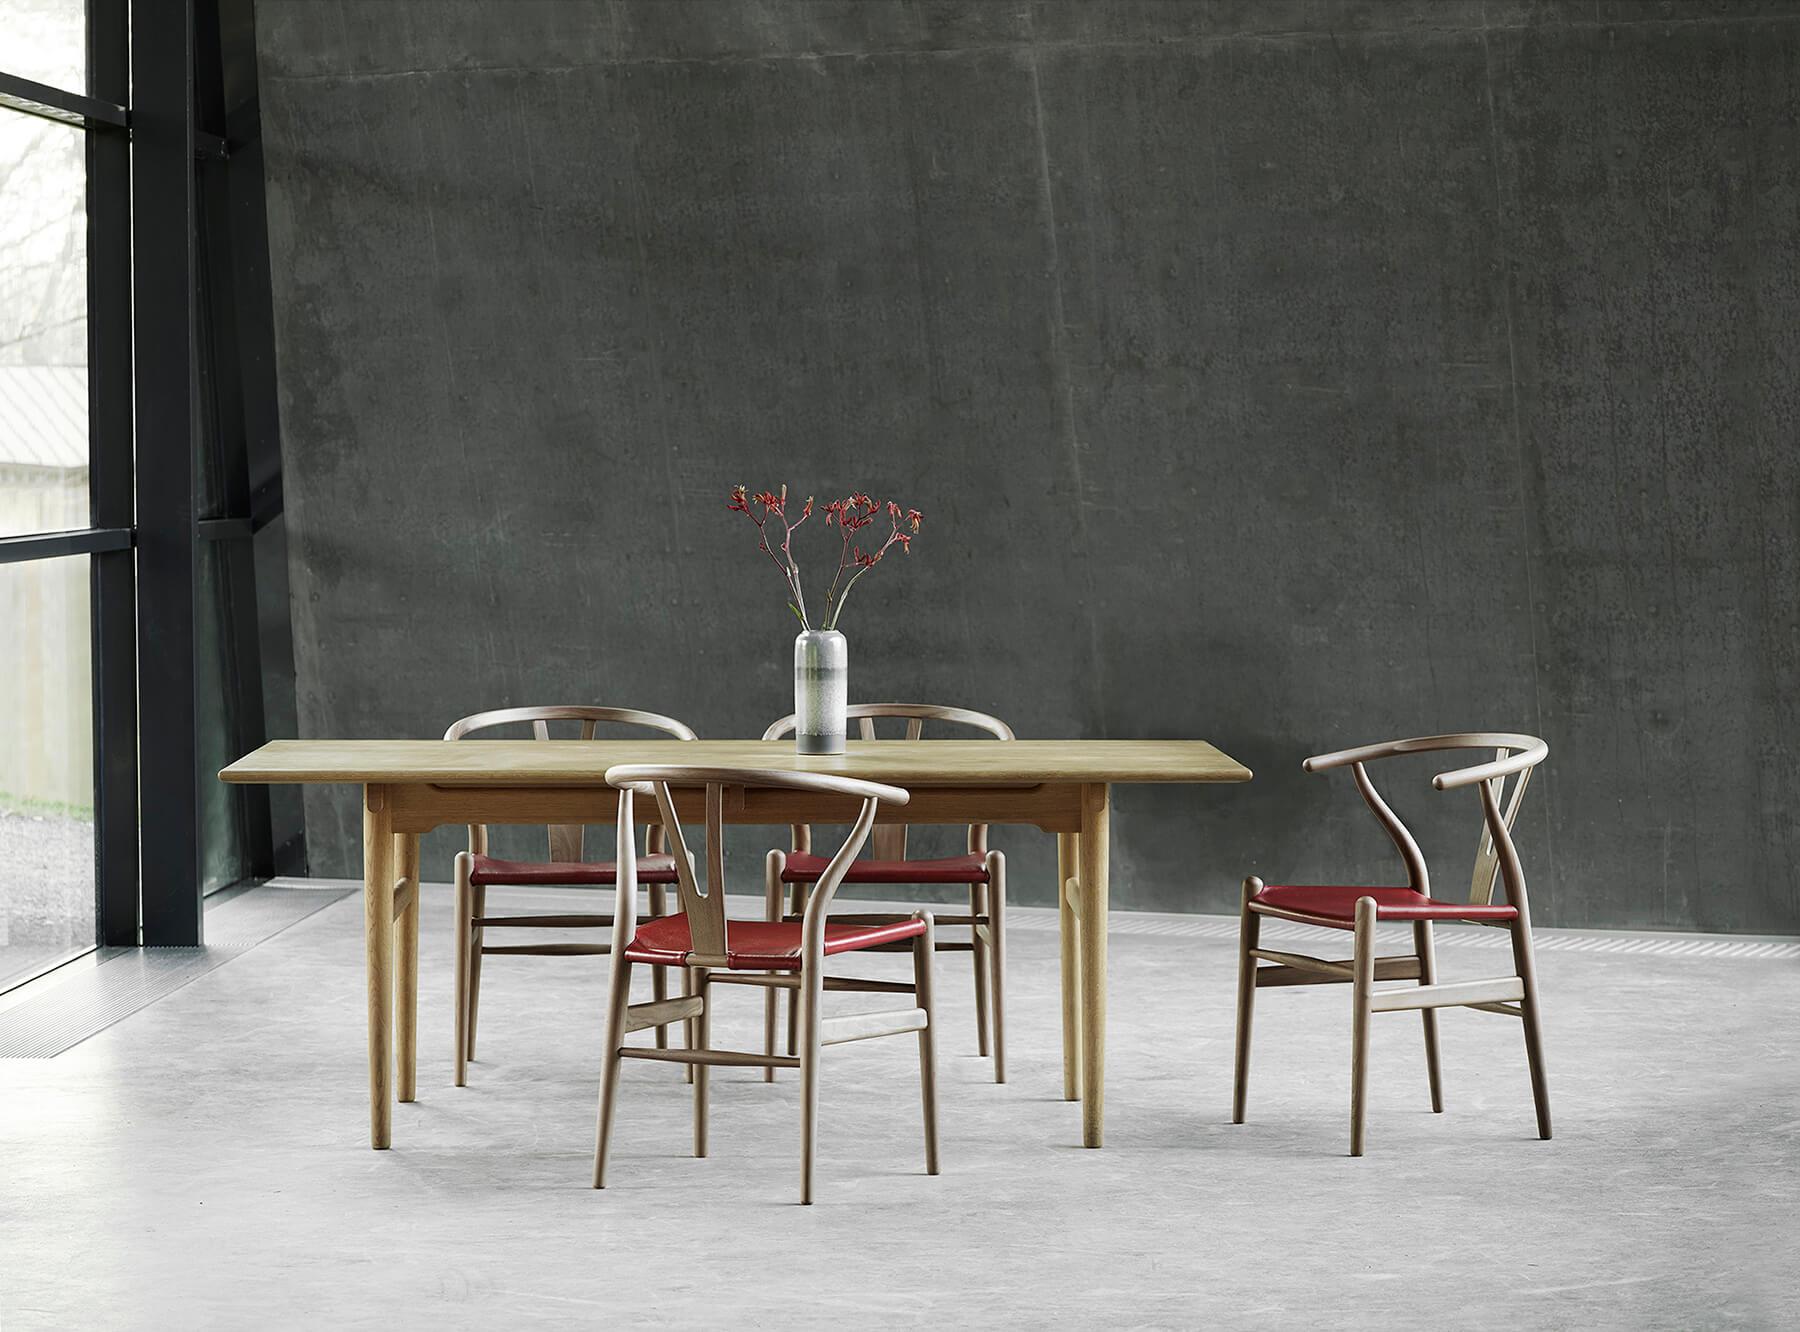 carl-hansen_wishbone-chair_Stuhl_02